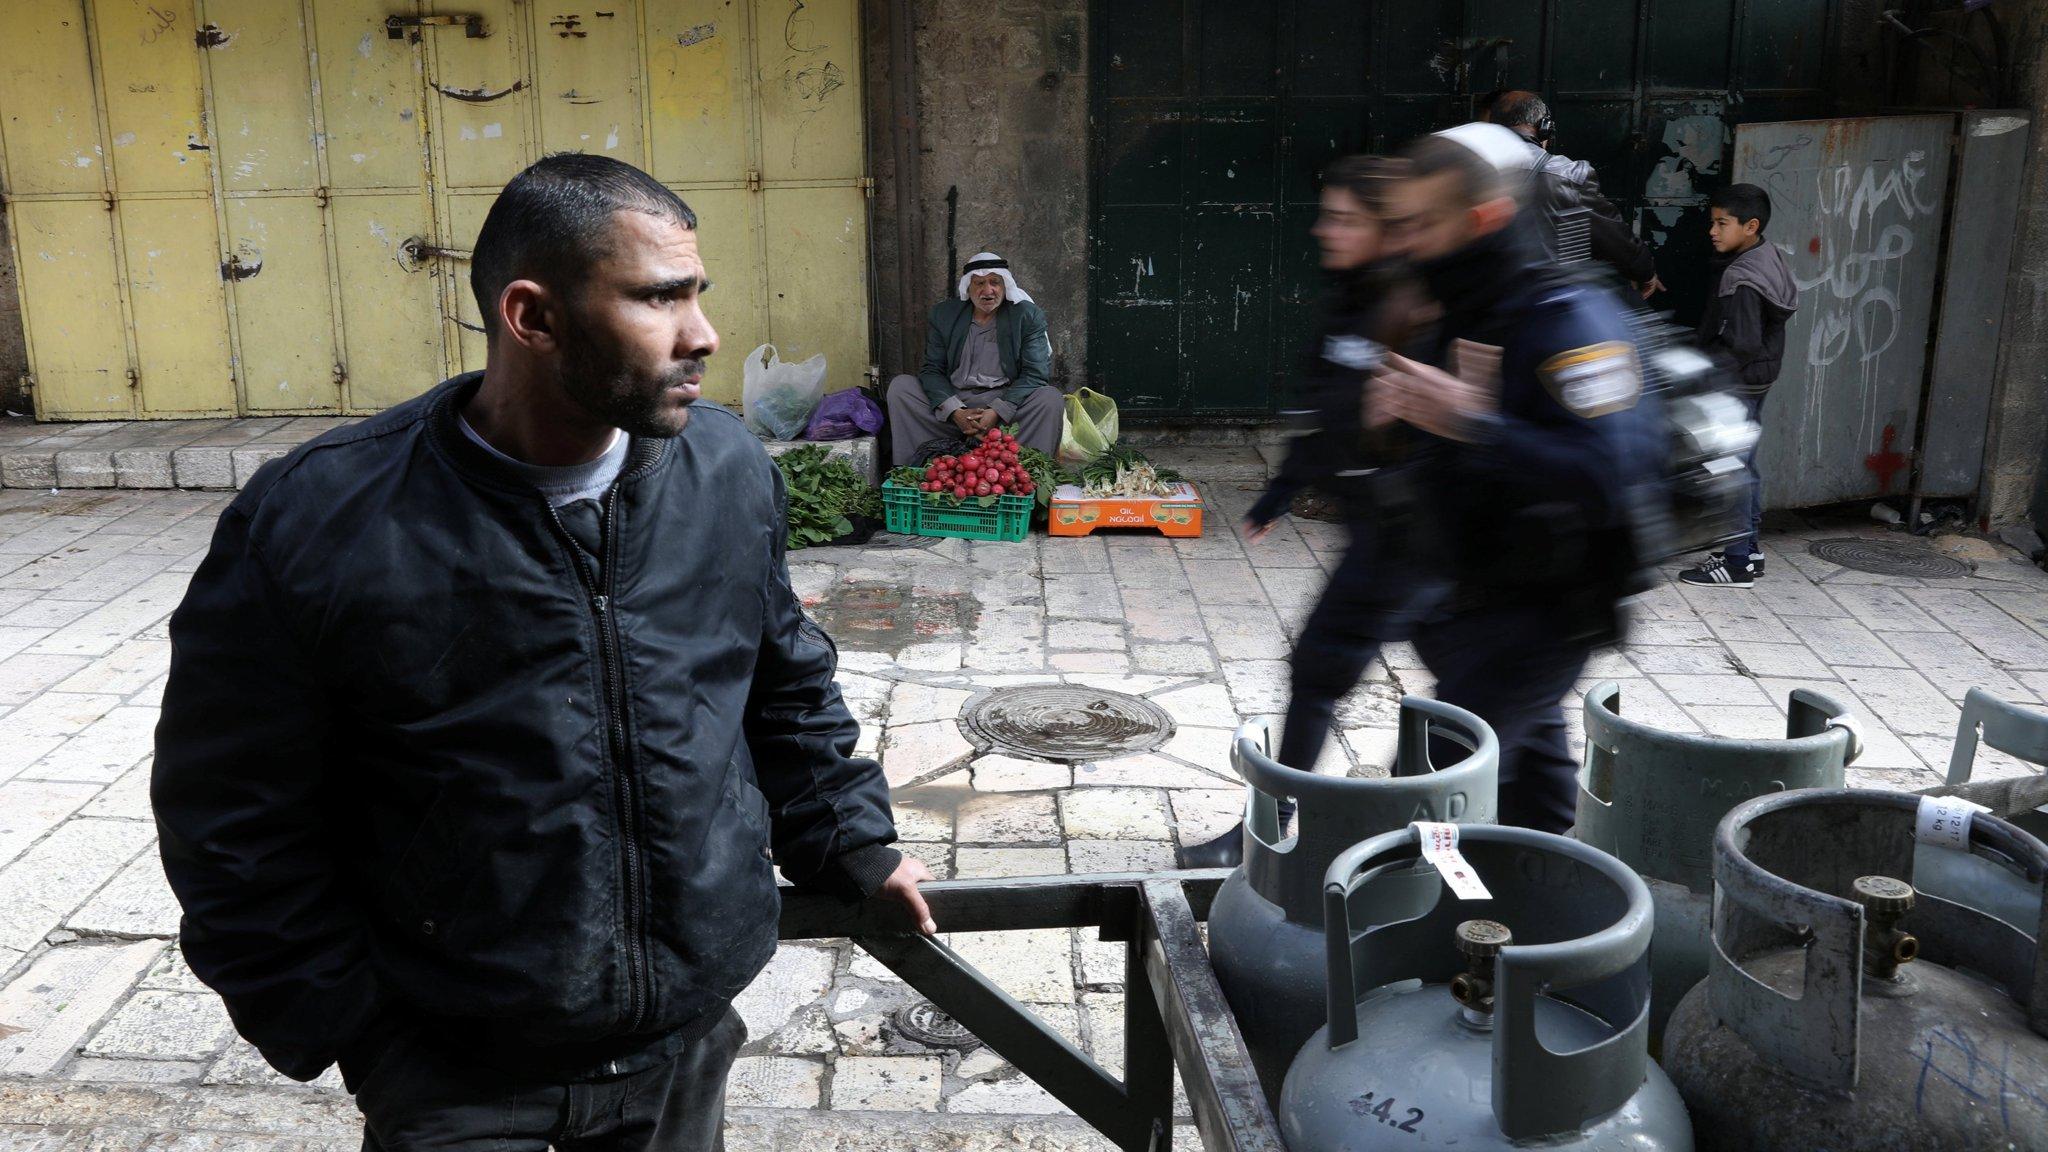 UN Security Council set to meet over US decision on Jerusalem